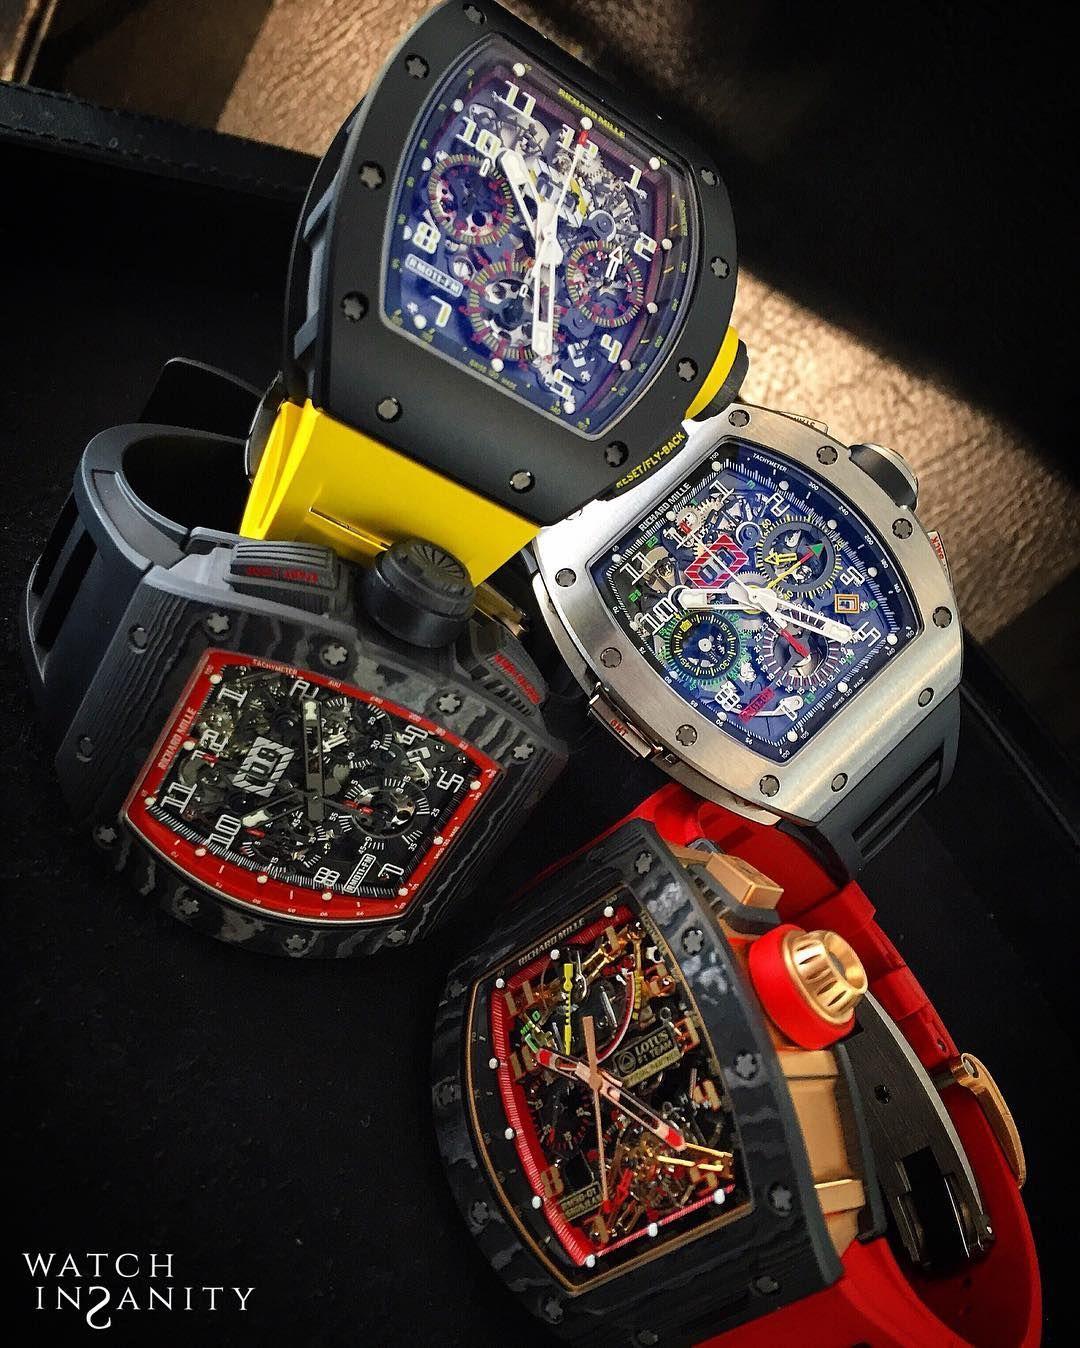 @richardmilleemea  Addiction RM011 Geneva Boutique Edition LE RM011 Felipe Massa BlackNight RM5O-01 Lotus F1 Team RM011 GMT #watchinsanity #richardmille #aracingmachineonthewrist #timepieces #watchs #billionairetoys #dailywatch #luxurywatch #horology #watchporn #womw #tourbillon #chronograph #wristshot #watchesofinstagram #watchnerd #watchoftheday #horophile #wruw #luxury #mondani #rolexero #gentleman #orogoli #montres #reloj #watchanish #wristporn #thebillionairesclub by watchinsanity